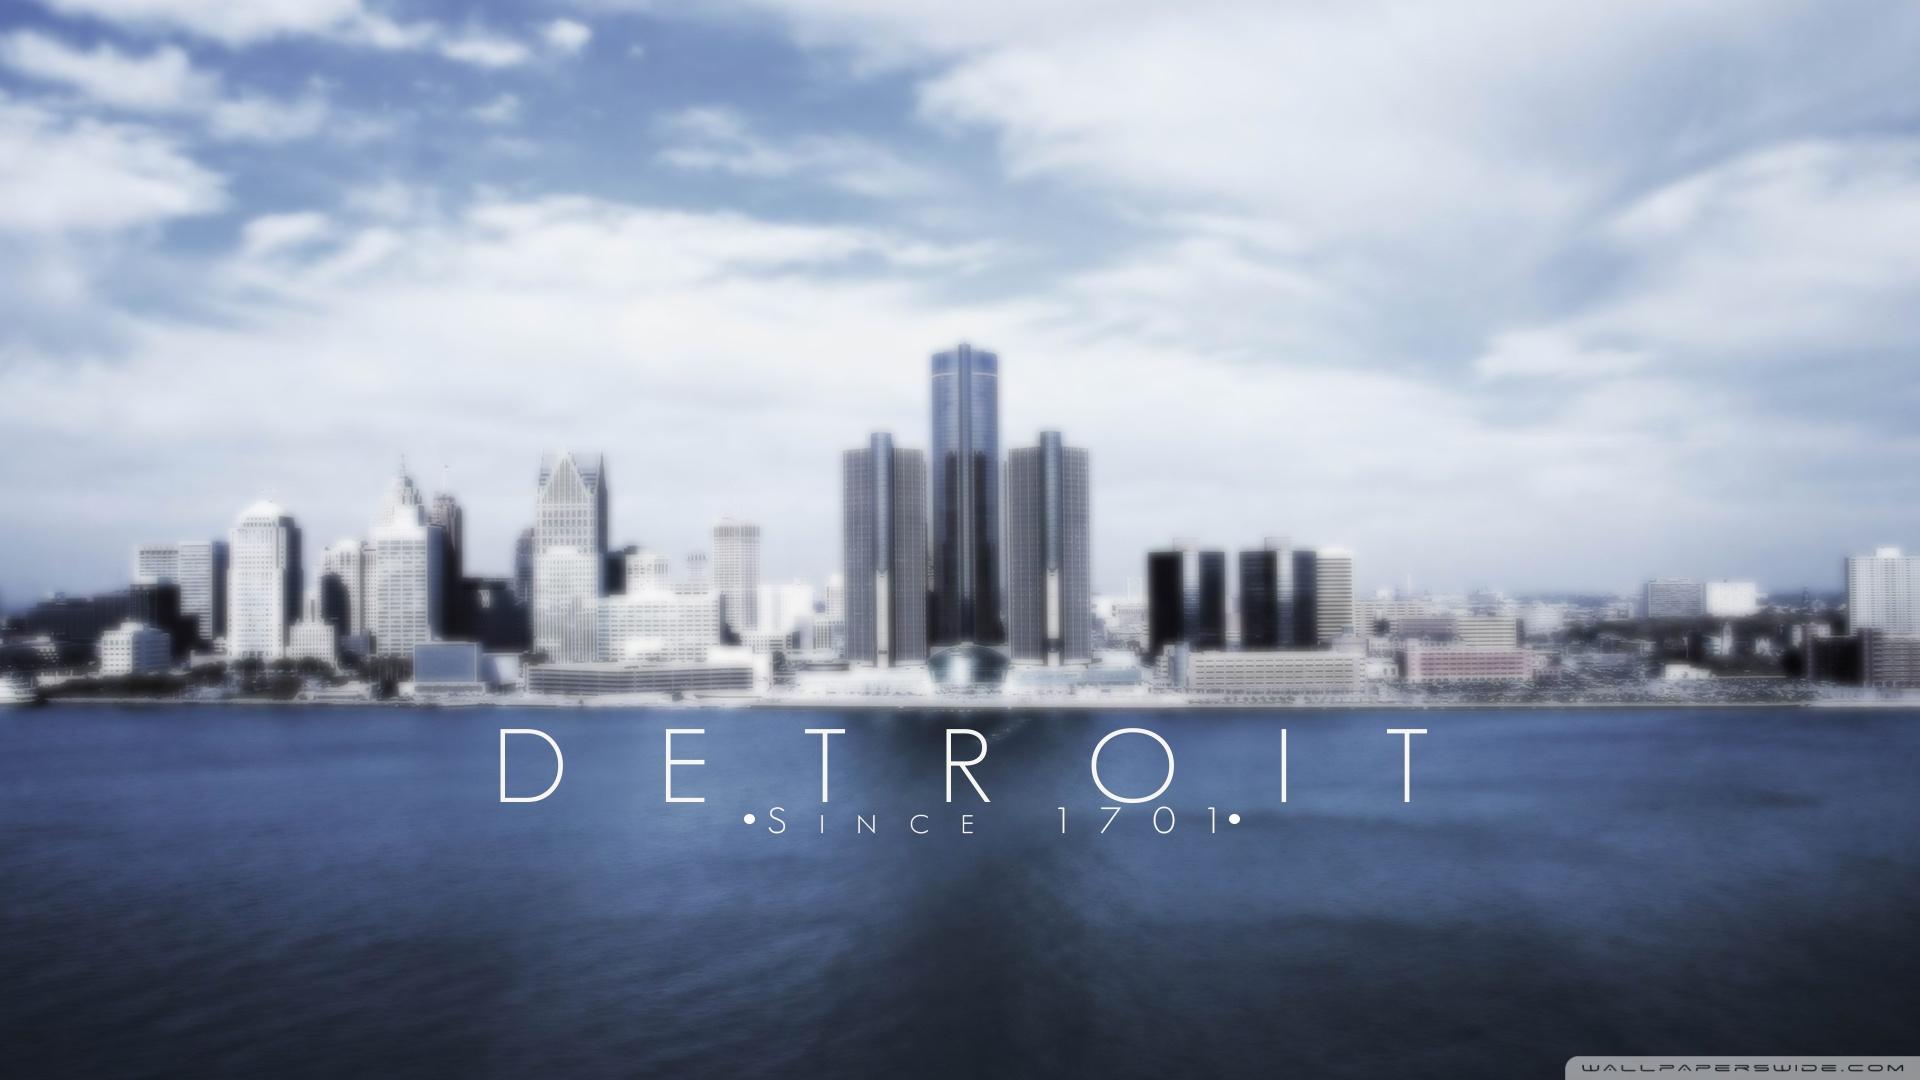 Detroit Tigers Iphone Wallpaper Detroit 4k Hd Desktop Wallpaper For 4k Ultra Hd Tv Wide